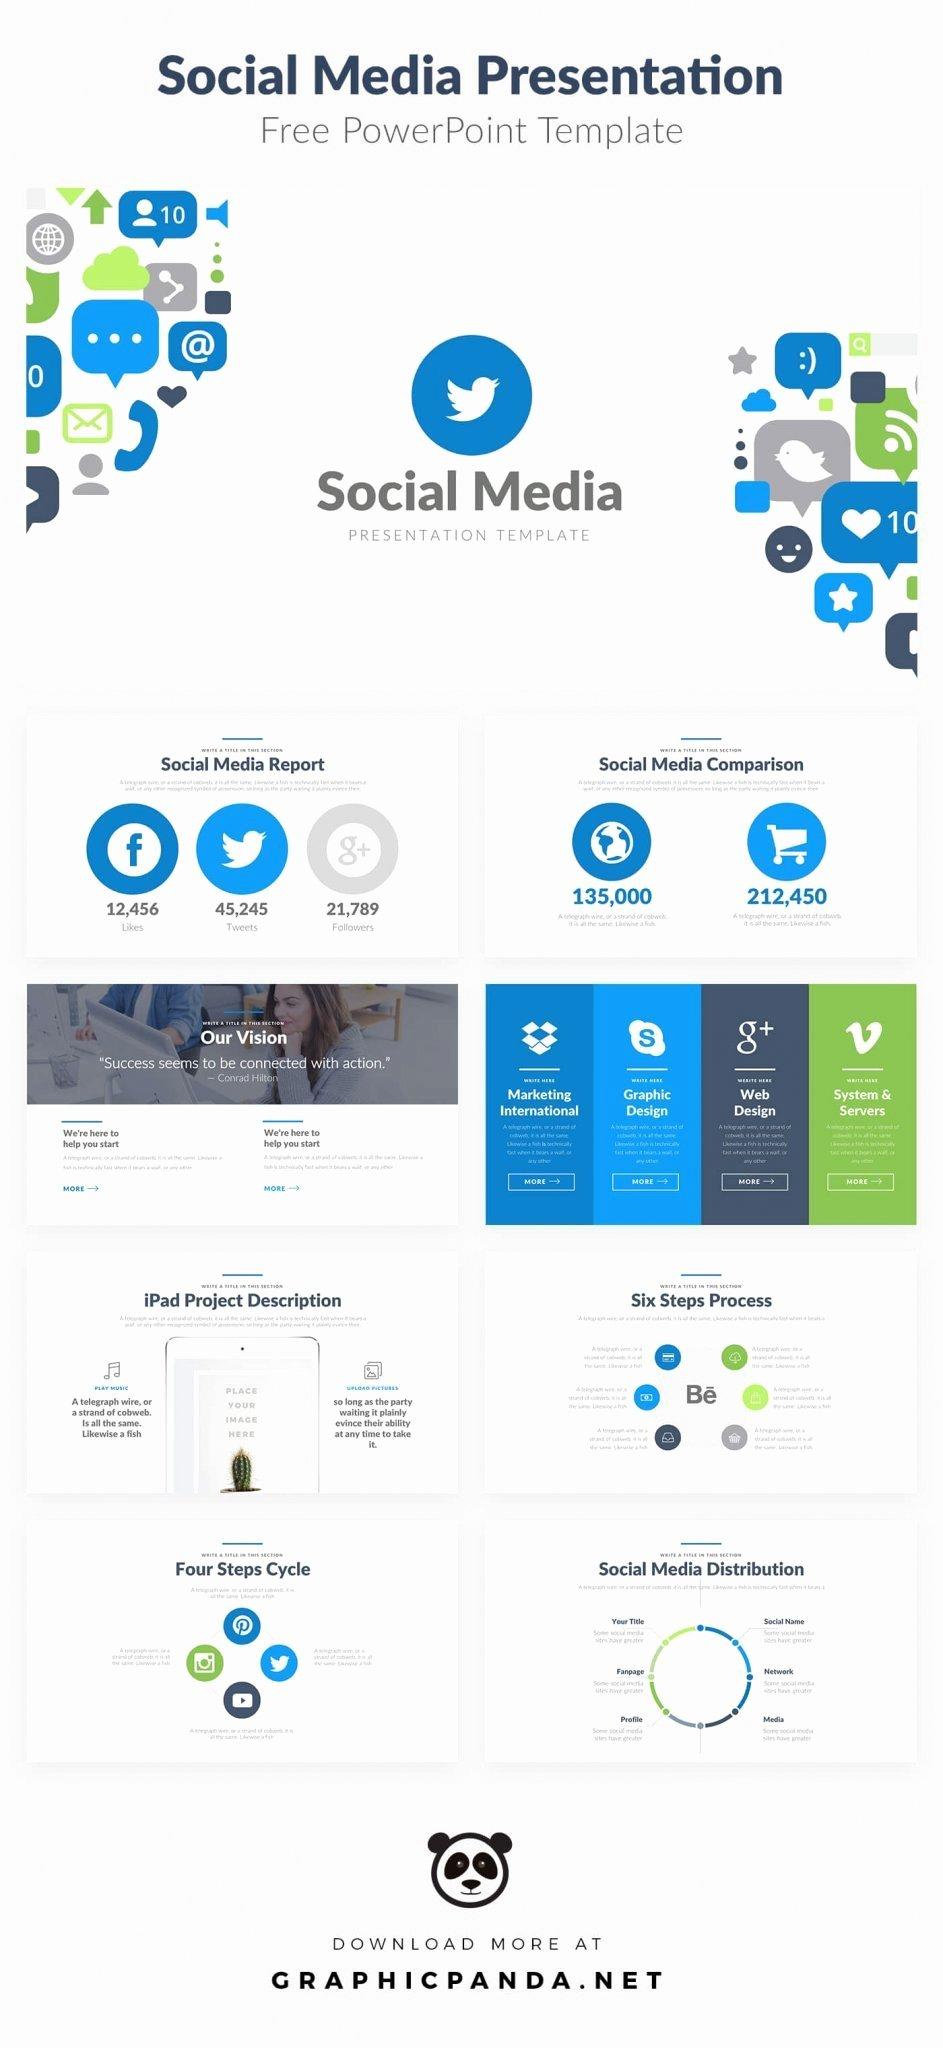 Social Media Website Template Lovely 10 Free social Media Slides Templates for Microsoft Powerpoint